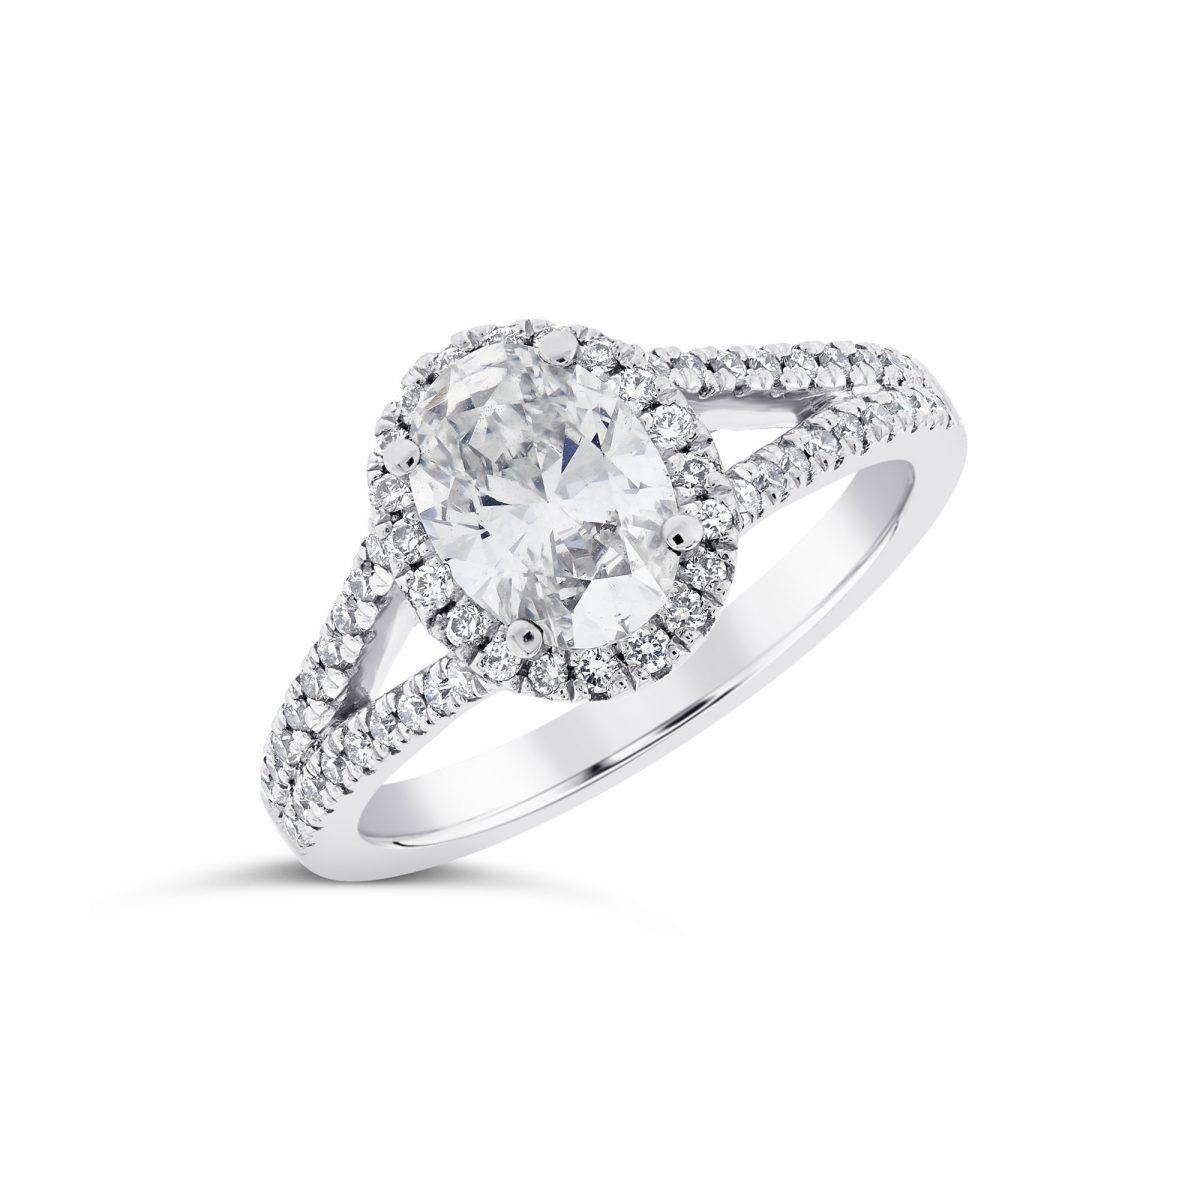 Oval Cut Platinum Diamond Halo Ring